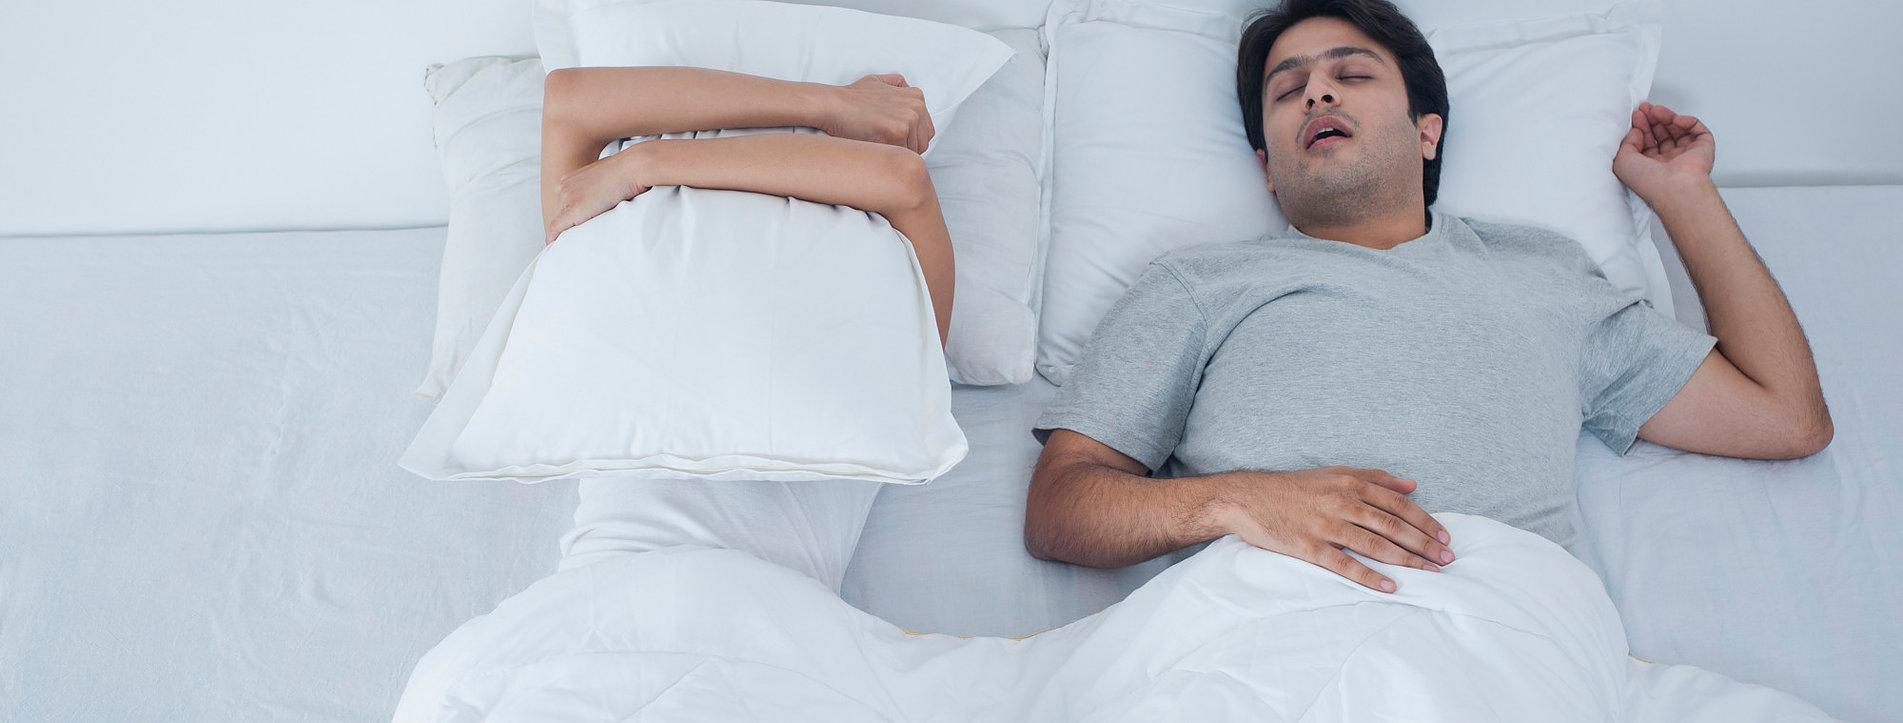 The Reality of Living Life With Sleep Apnea